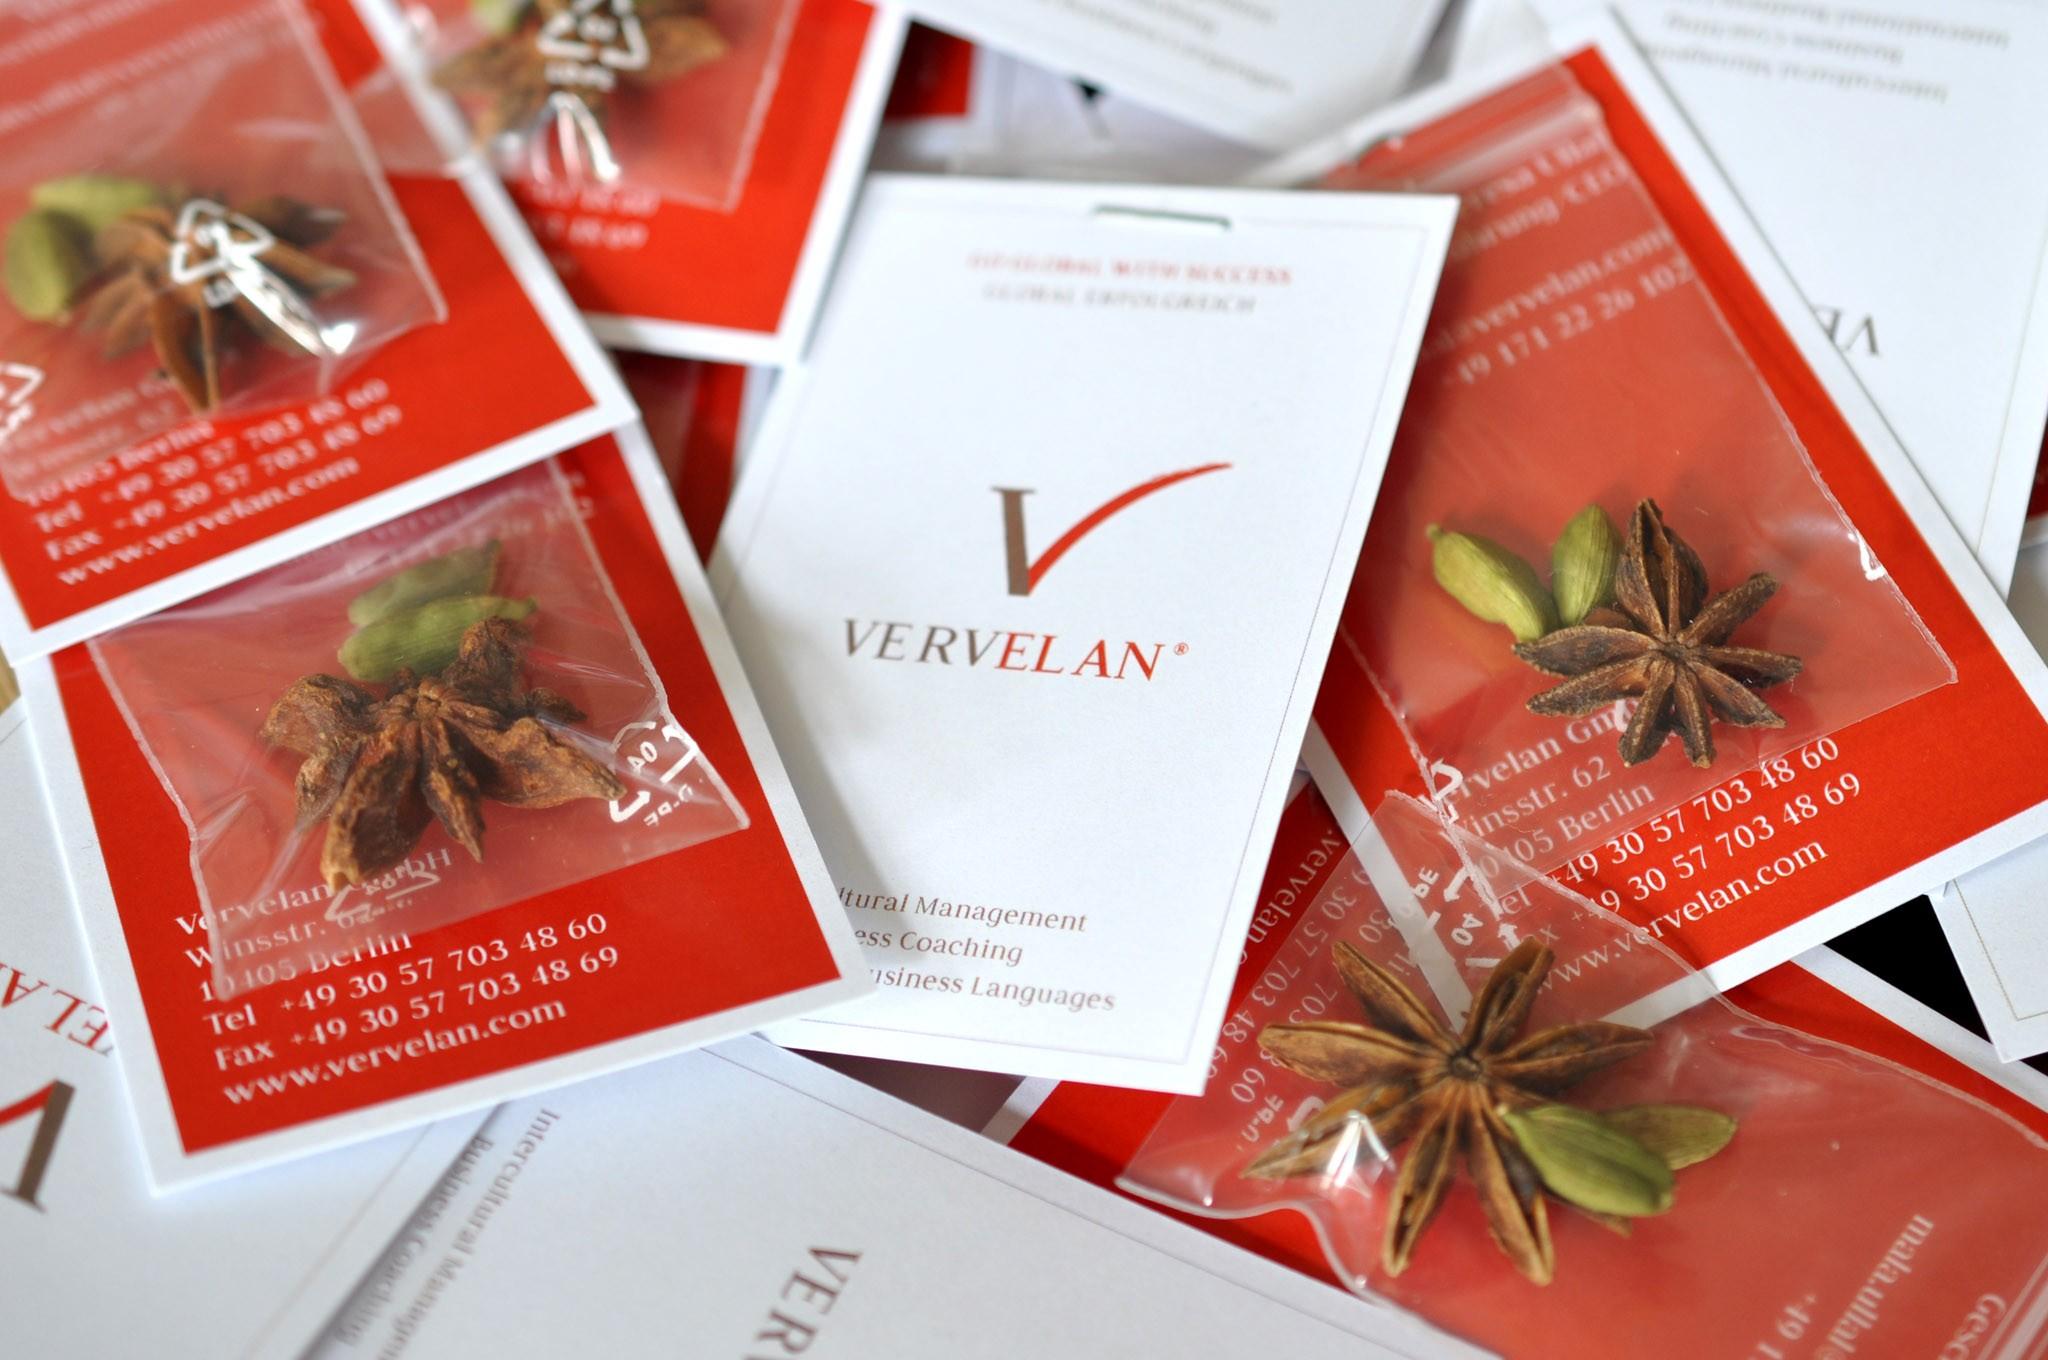 Vervelan GmbH